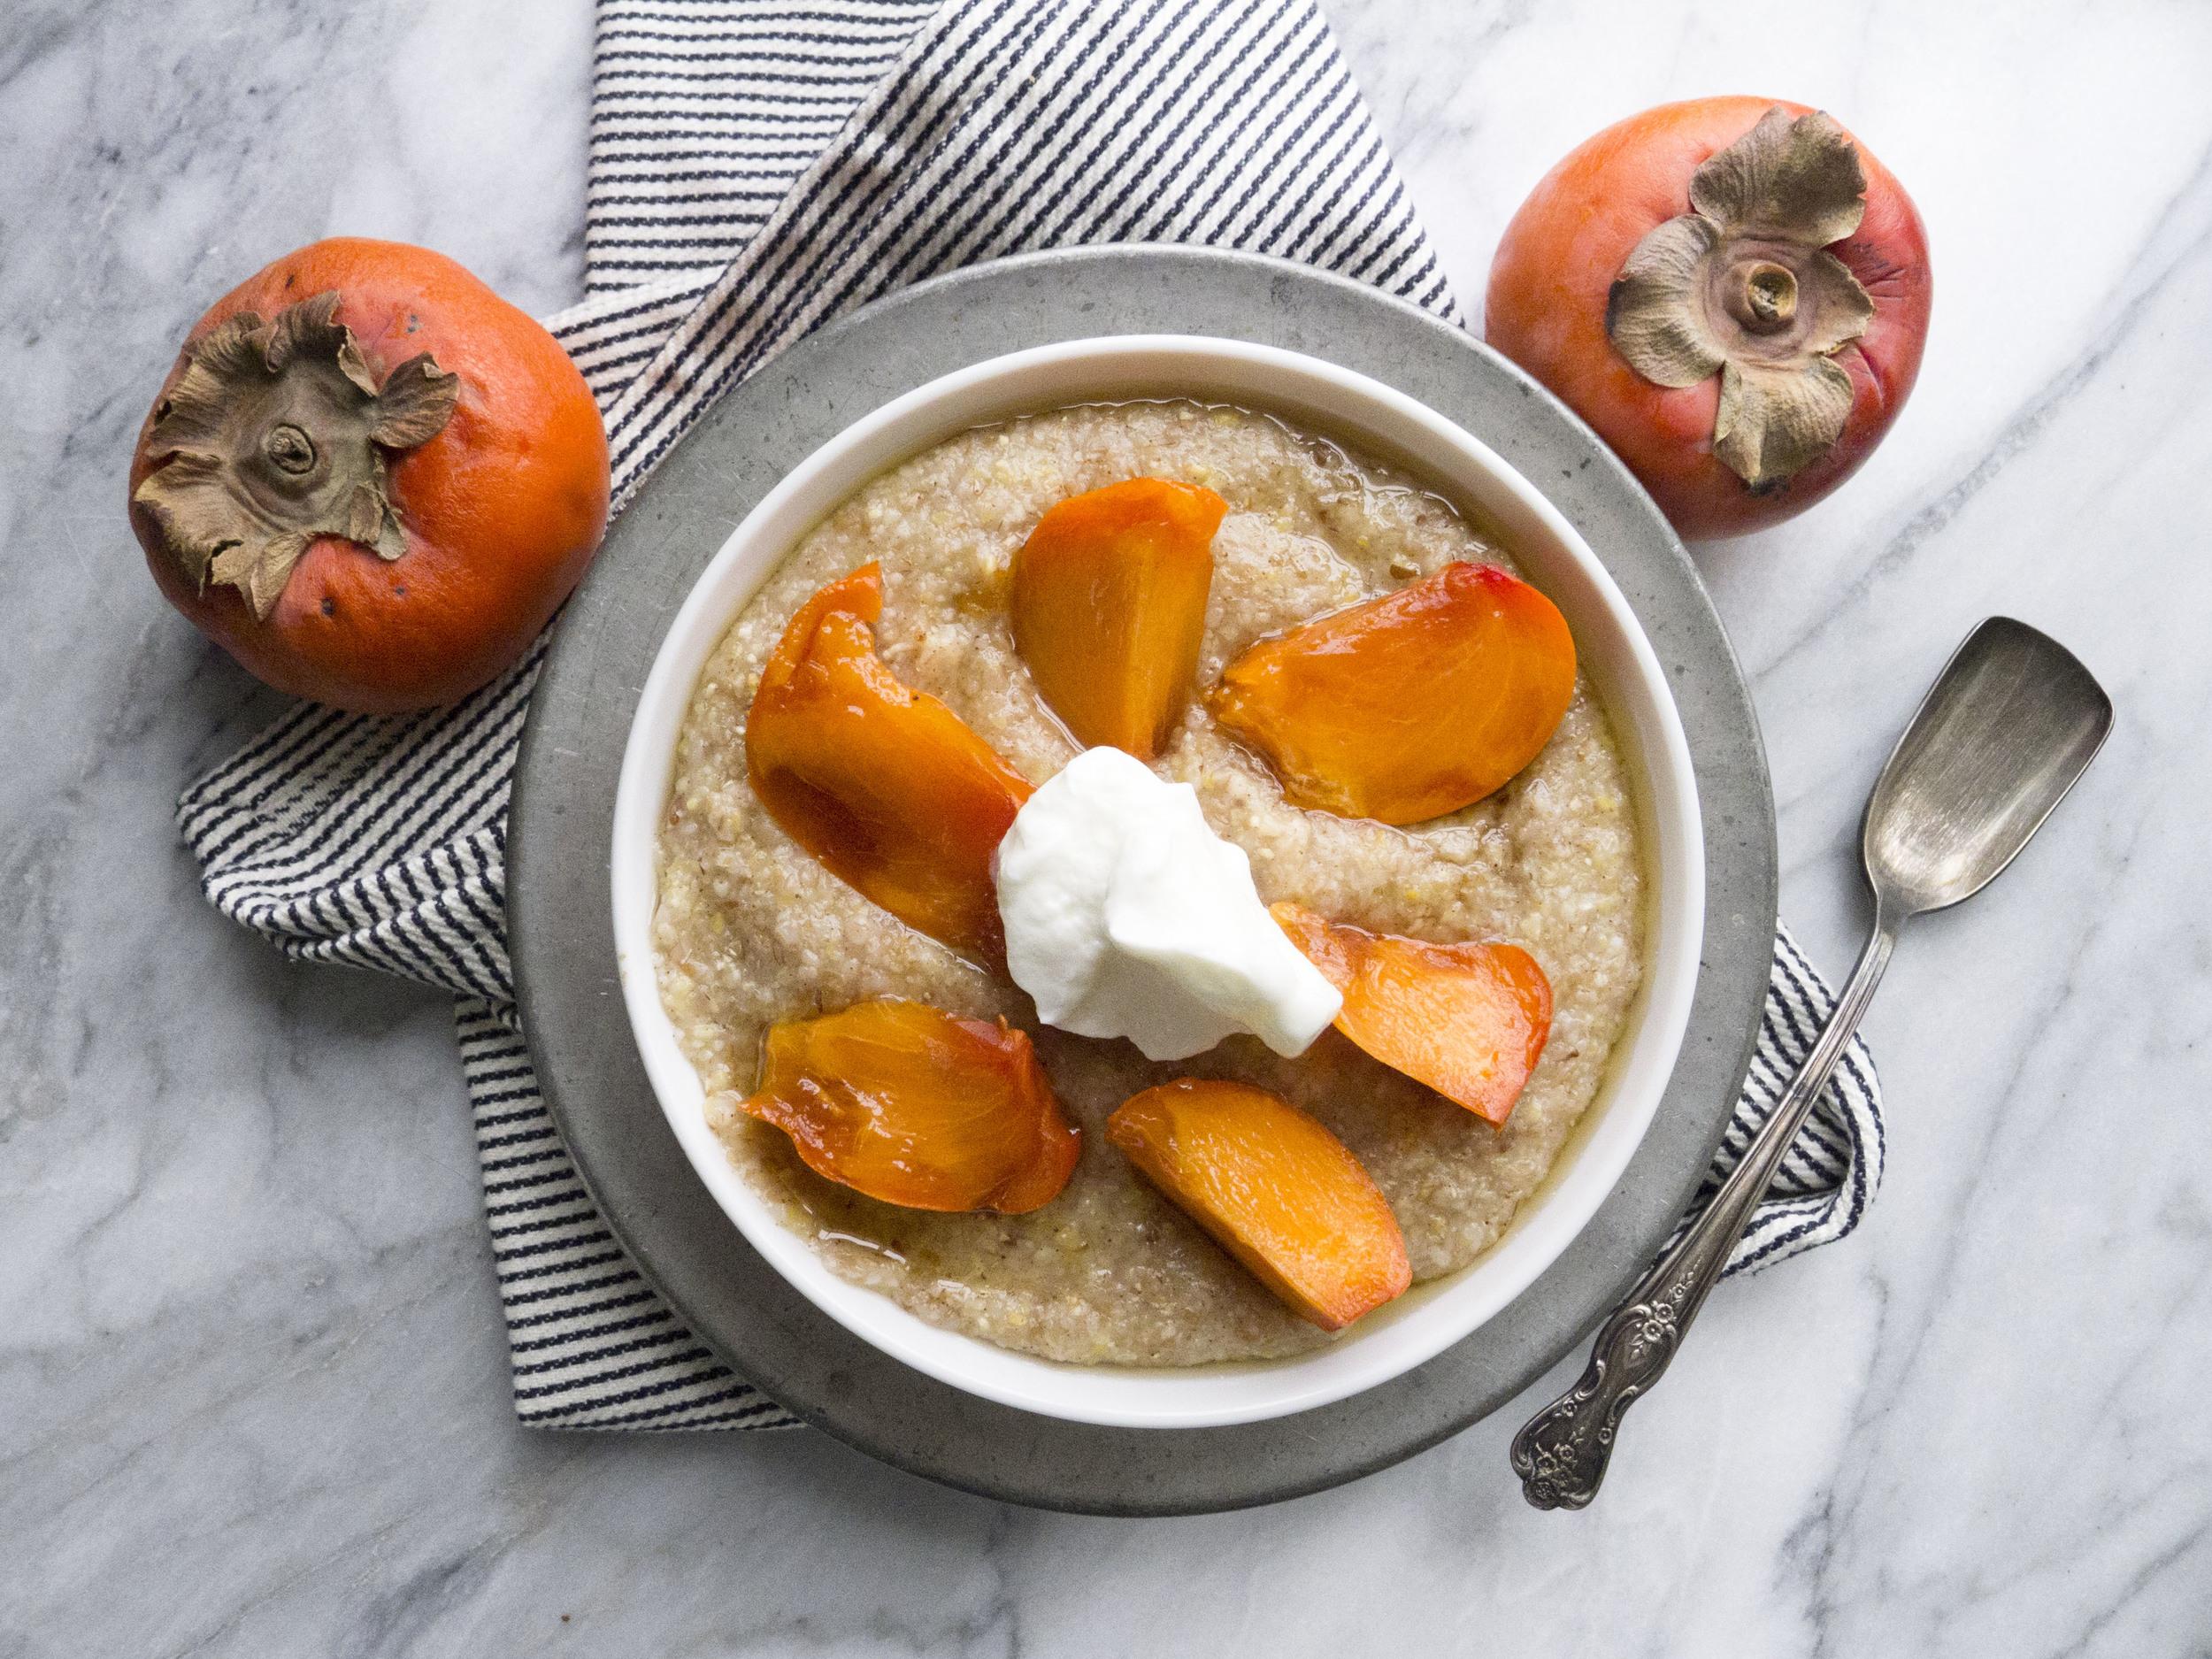 Persimmon 10 Grain Hot Cereal